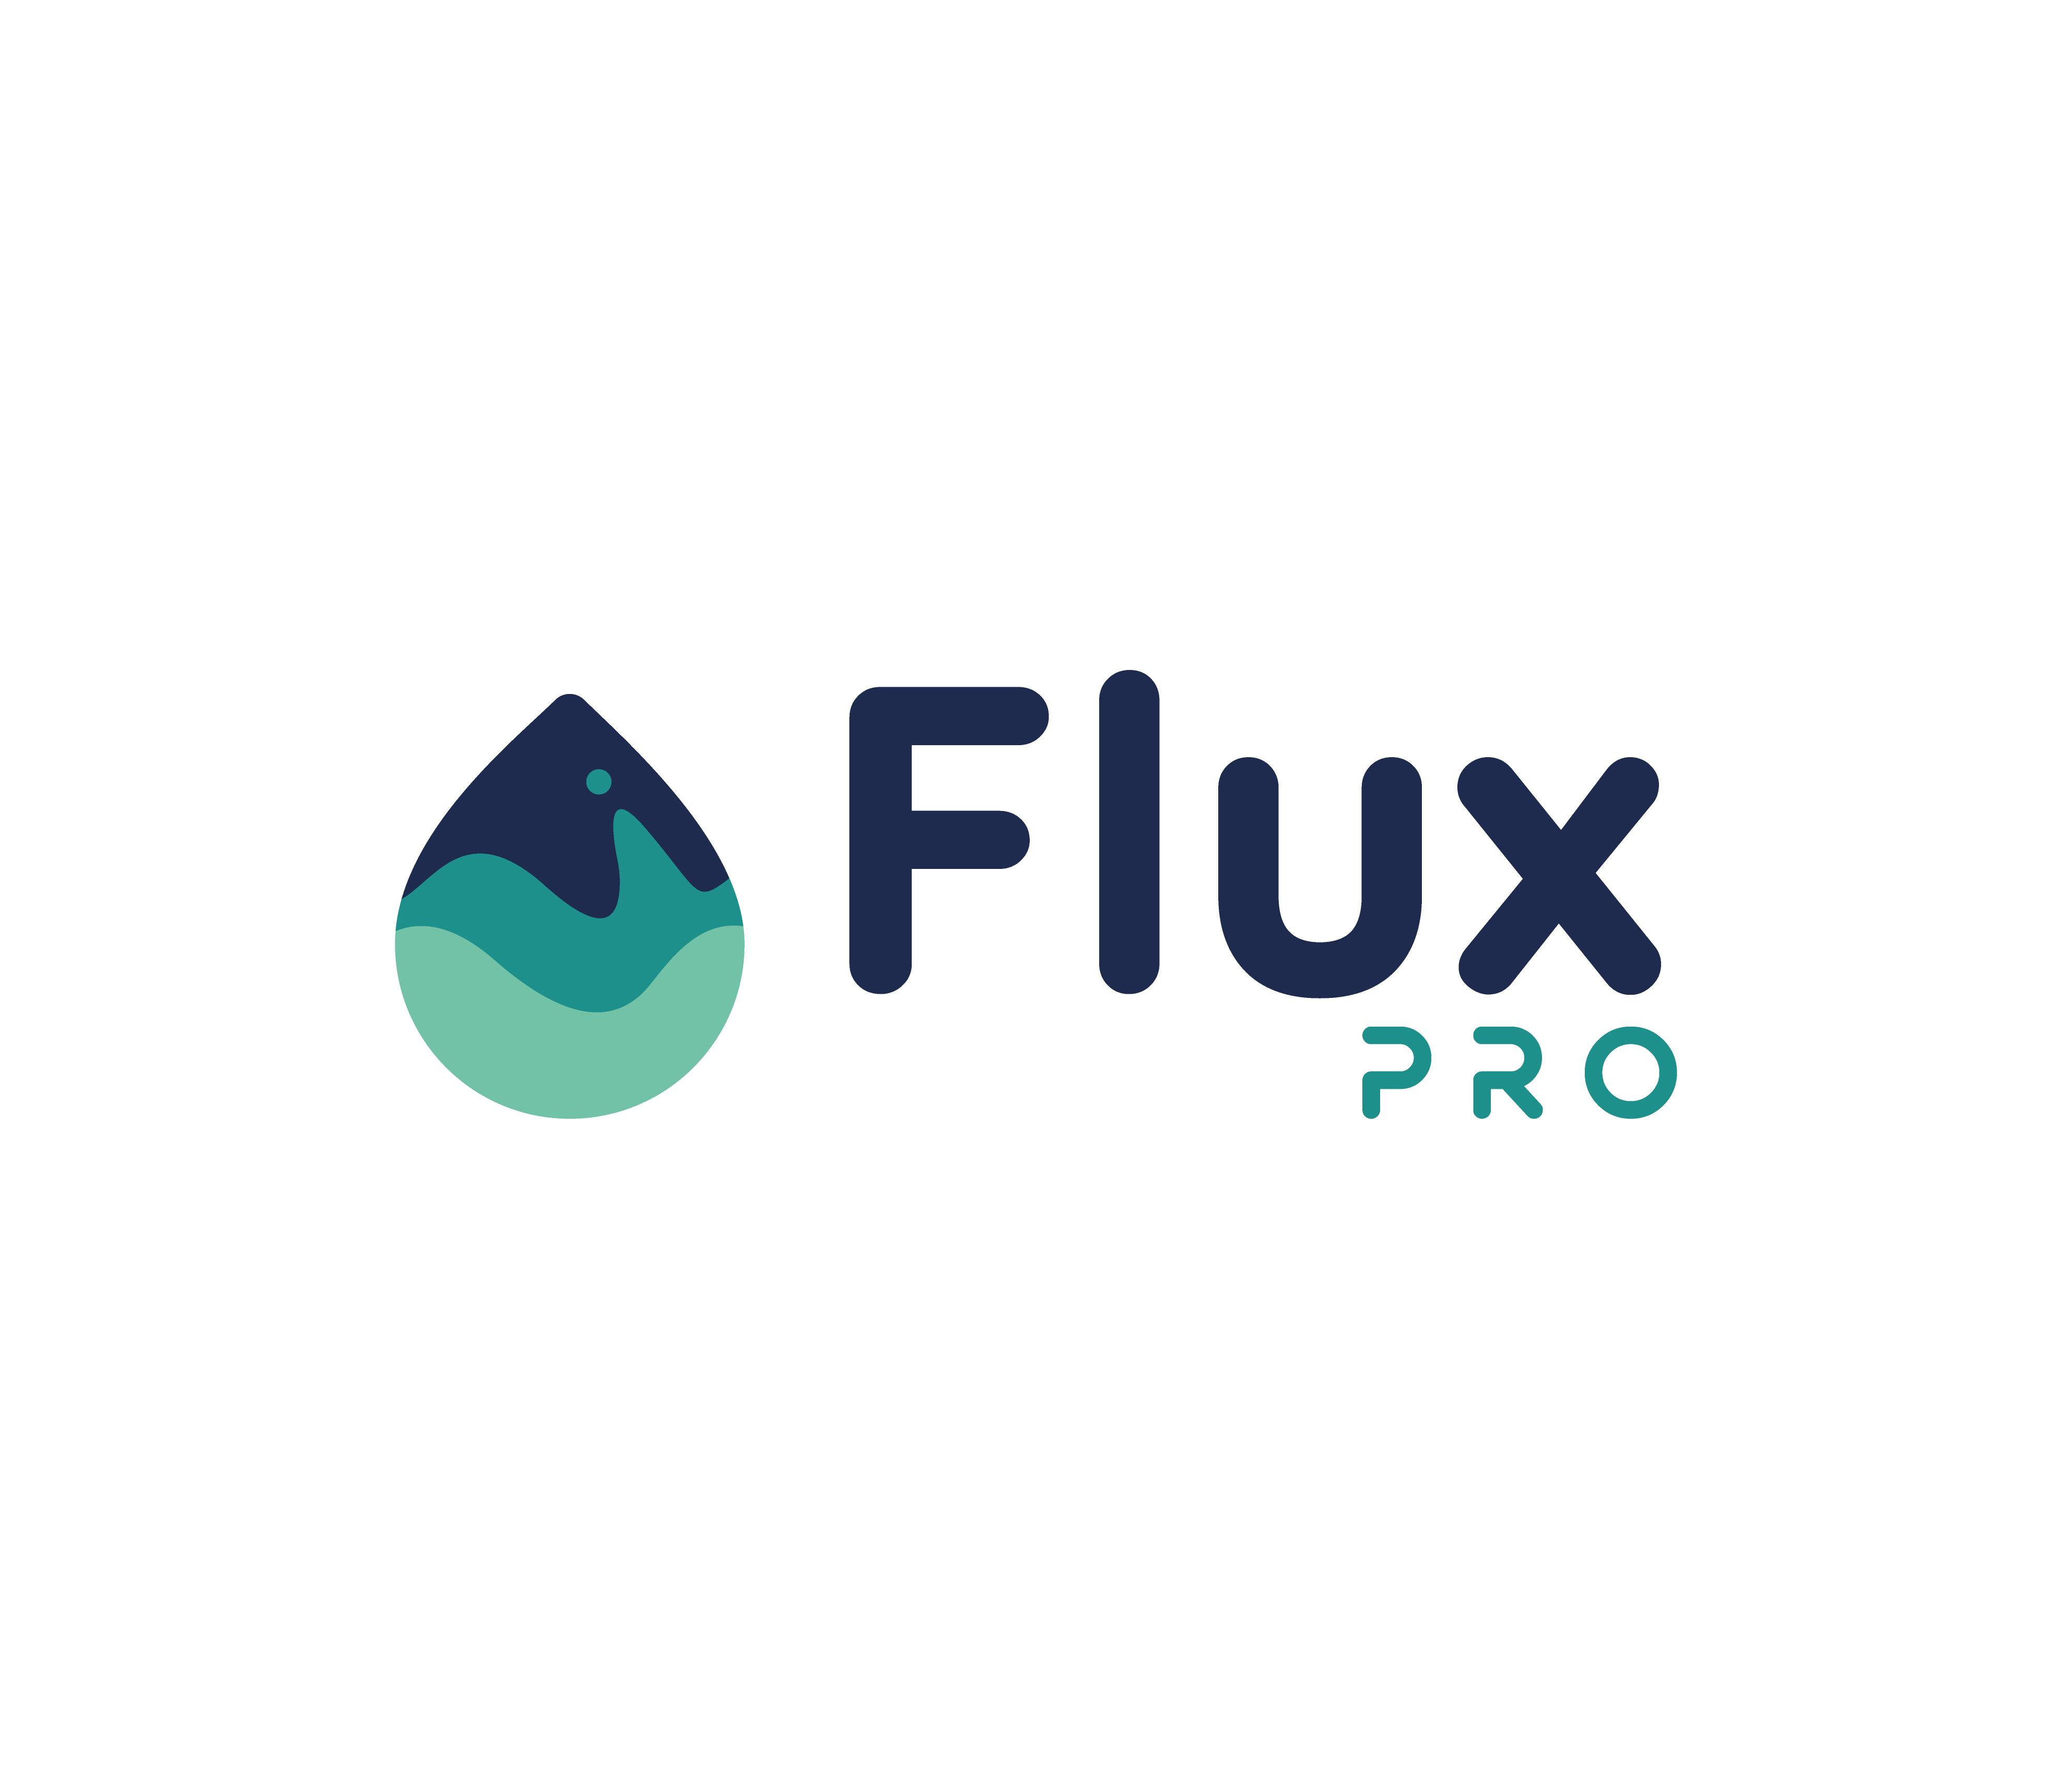 Flux Startup logo